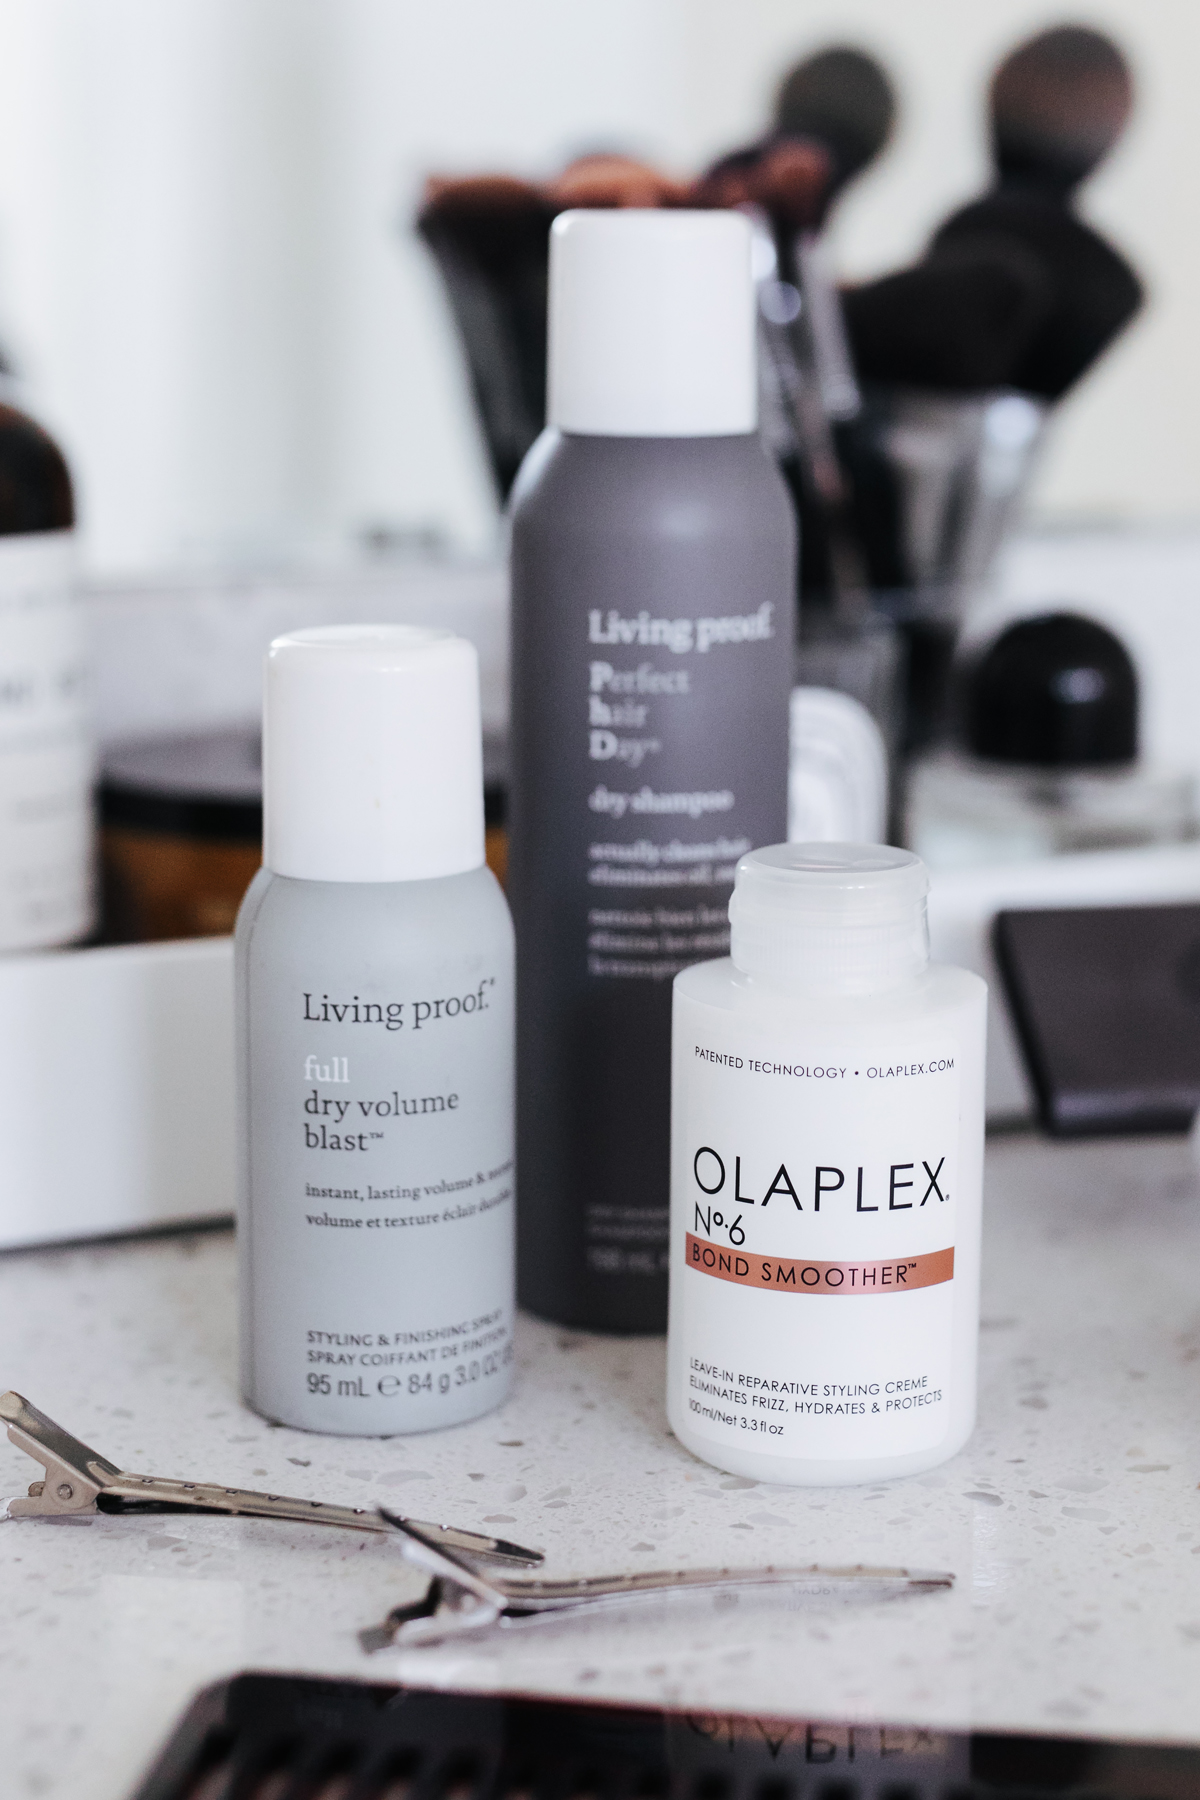 Olaplex Bond Smoother Living Proof Full Dry Volume Blast Living Proof Dry Shampoo